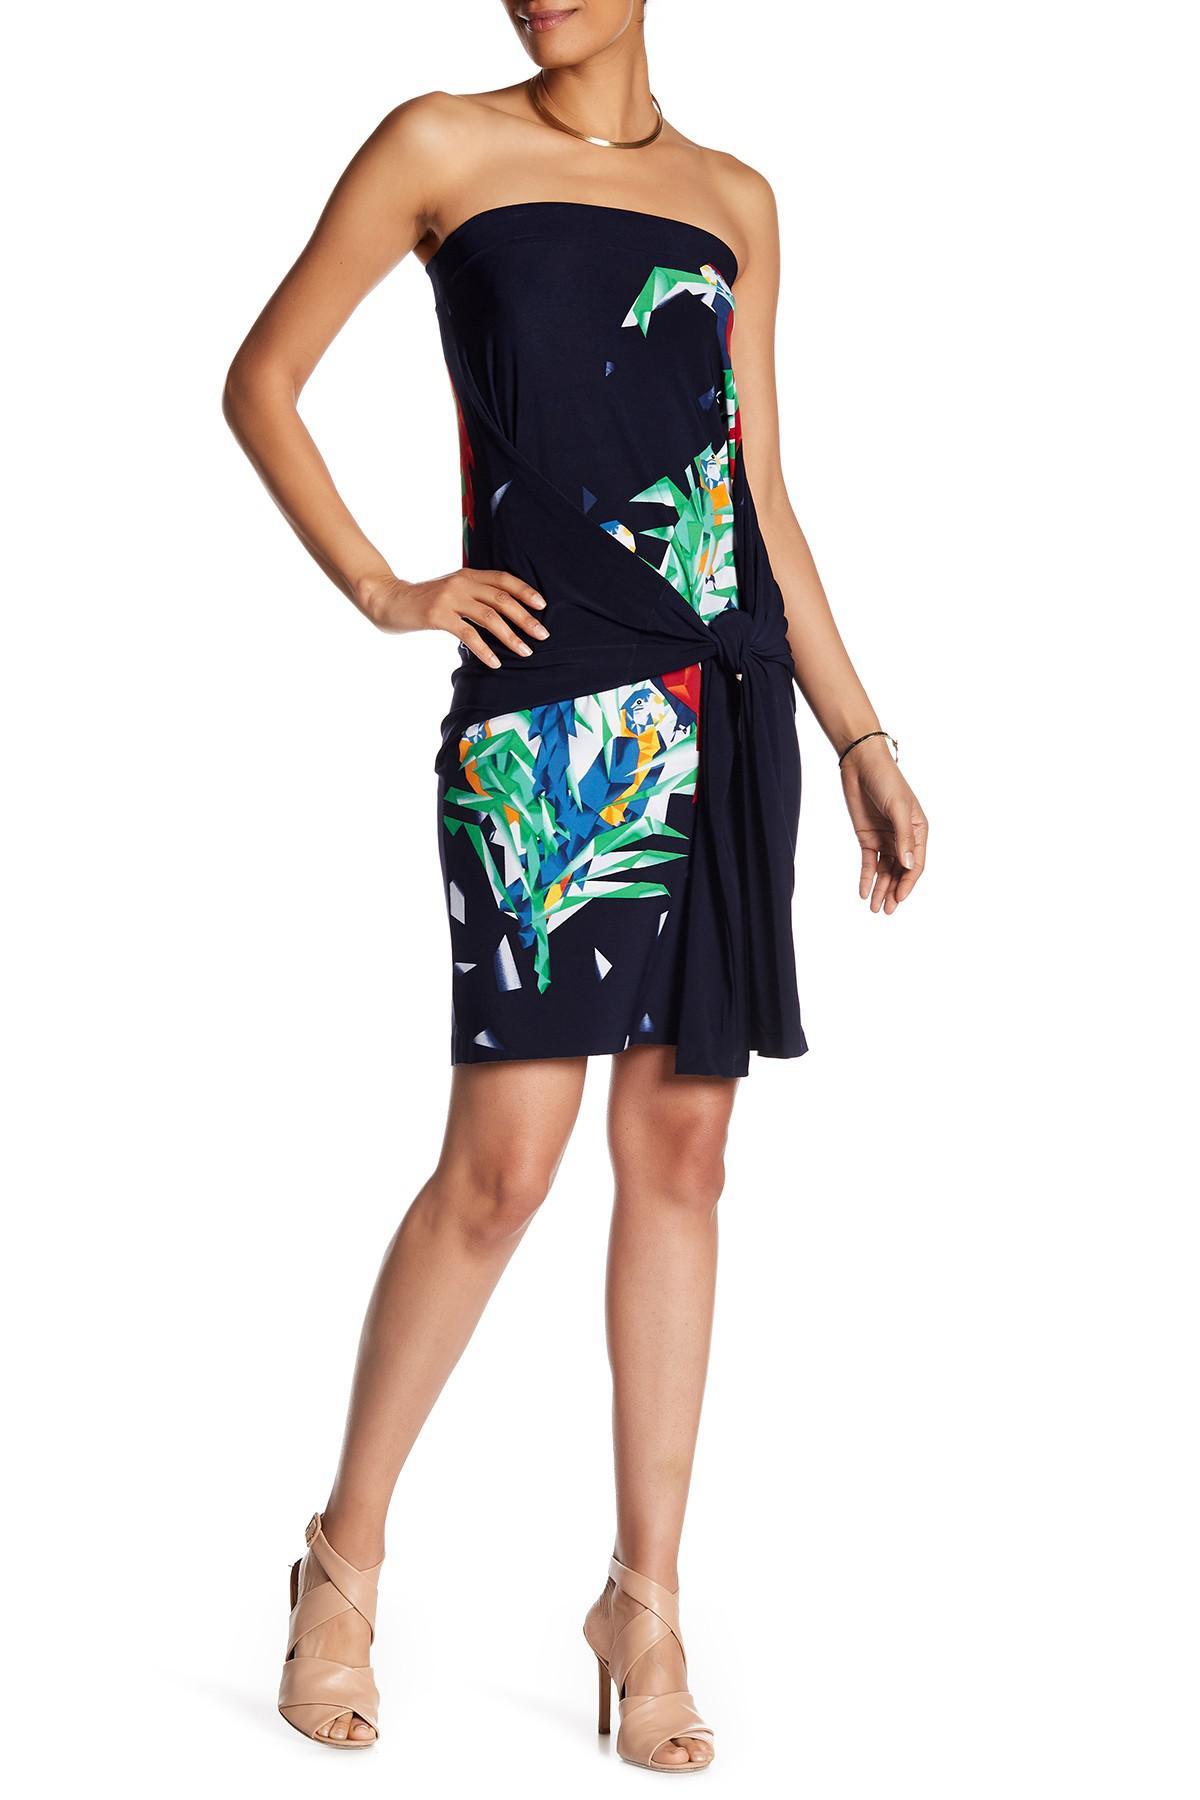 97dd18a9ca4e Lyst - Norma Kamali All In One Convertible Mini Dress